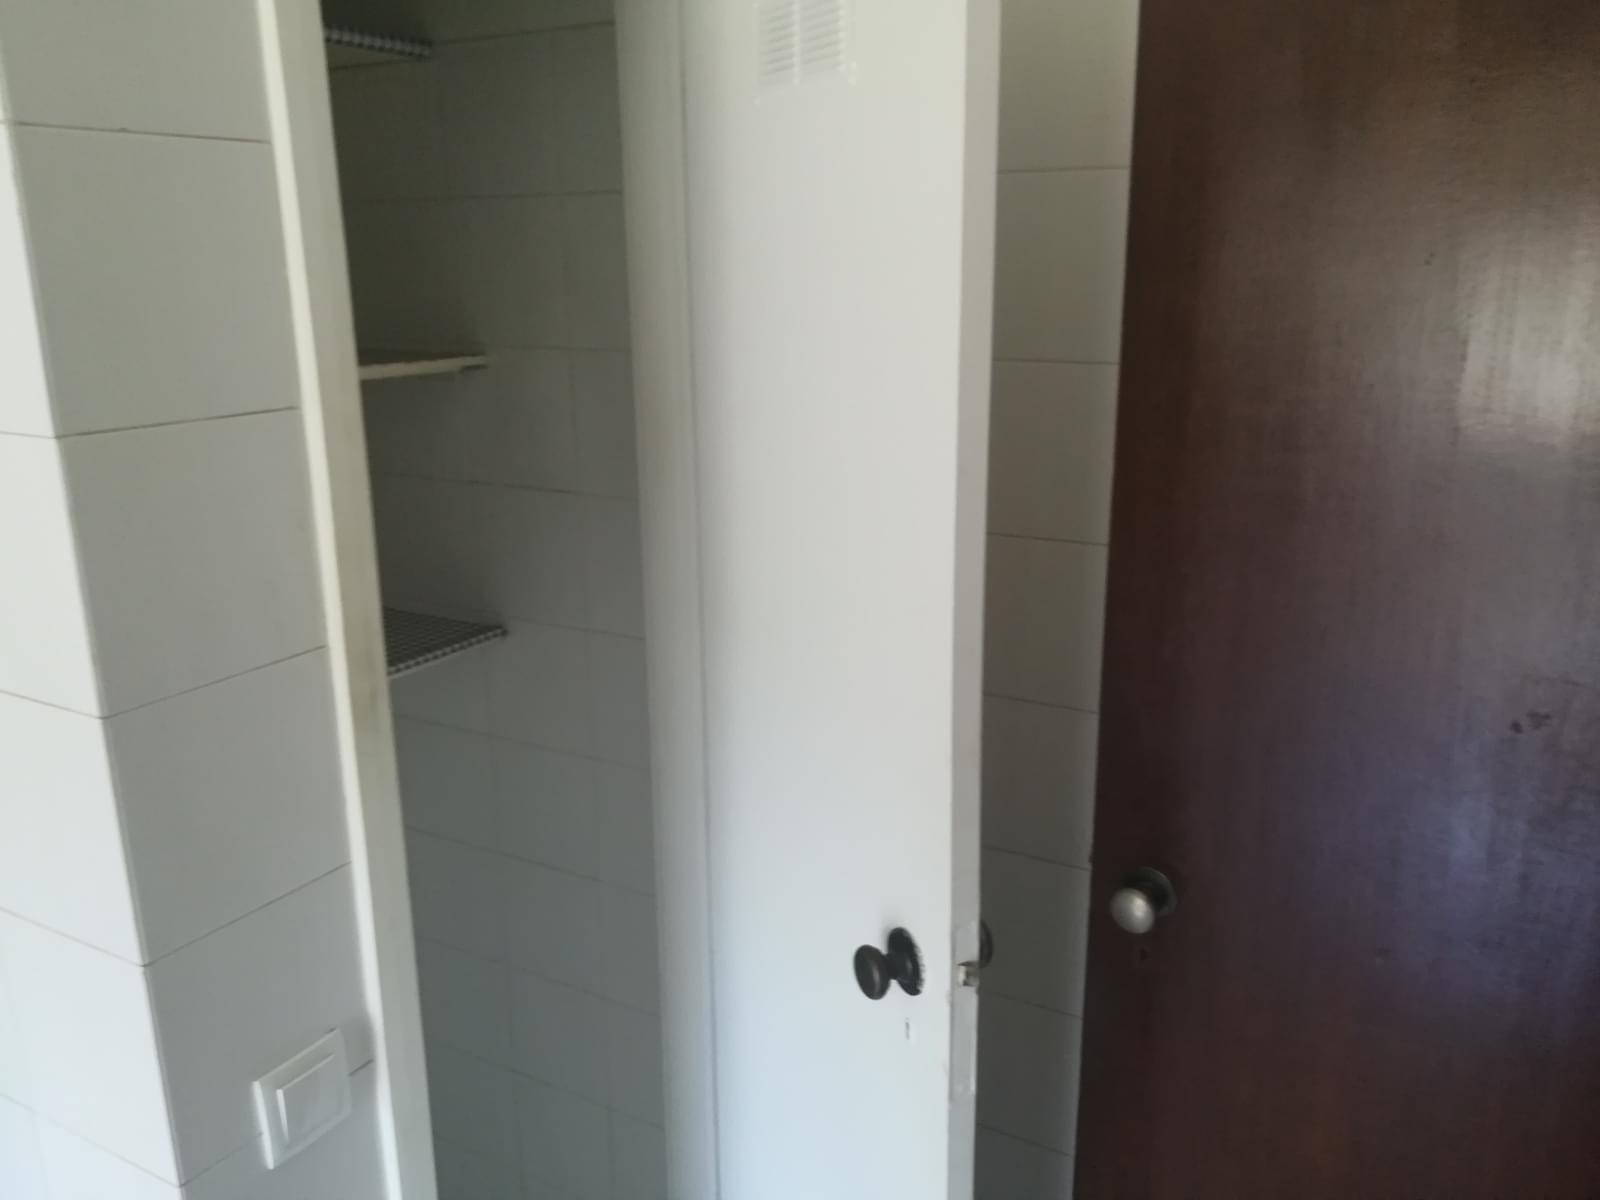 pf17568-apartamento-t3-oeiras-c0041775-d0ca-4314-93dc-041a0f2b1bf3